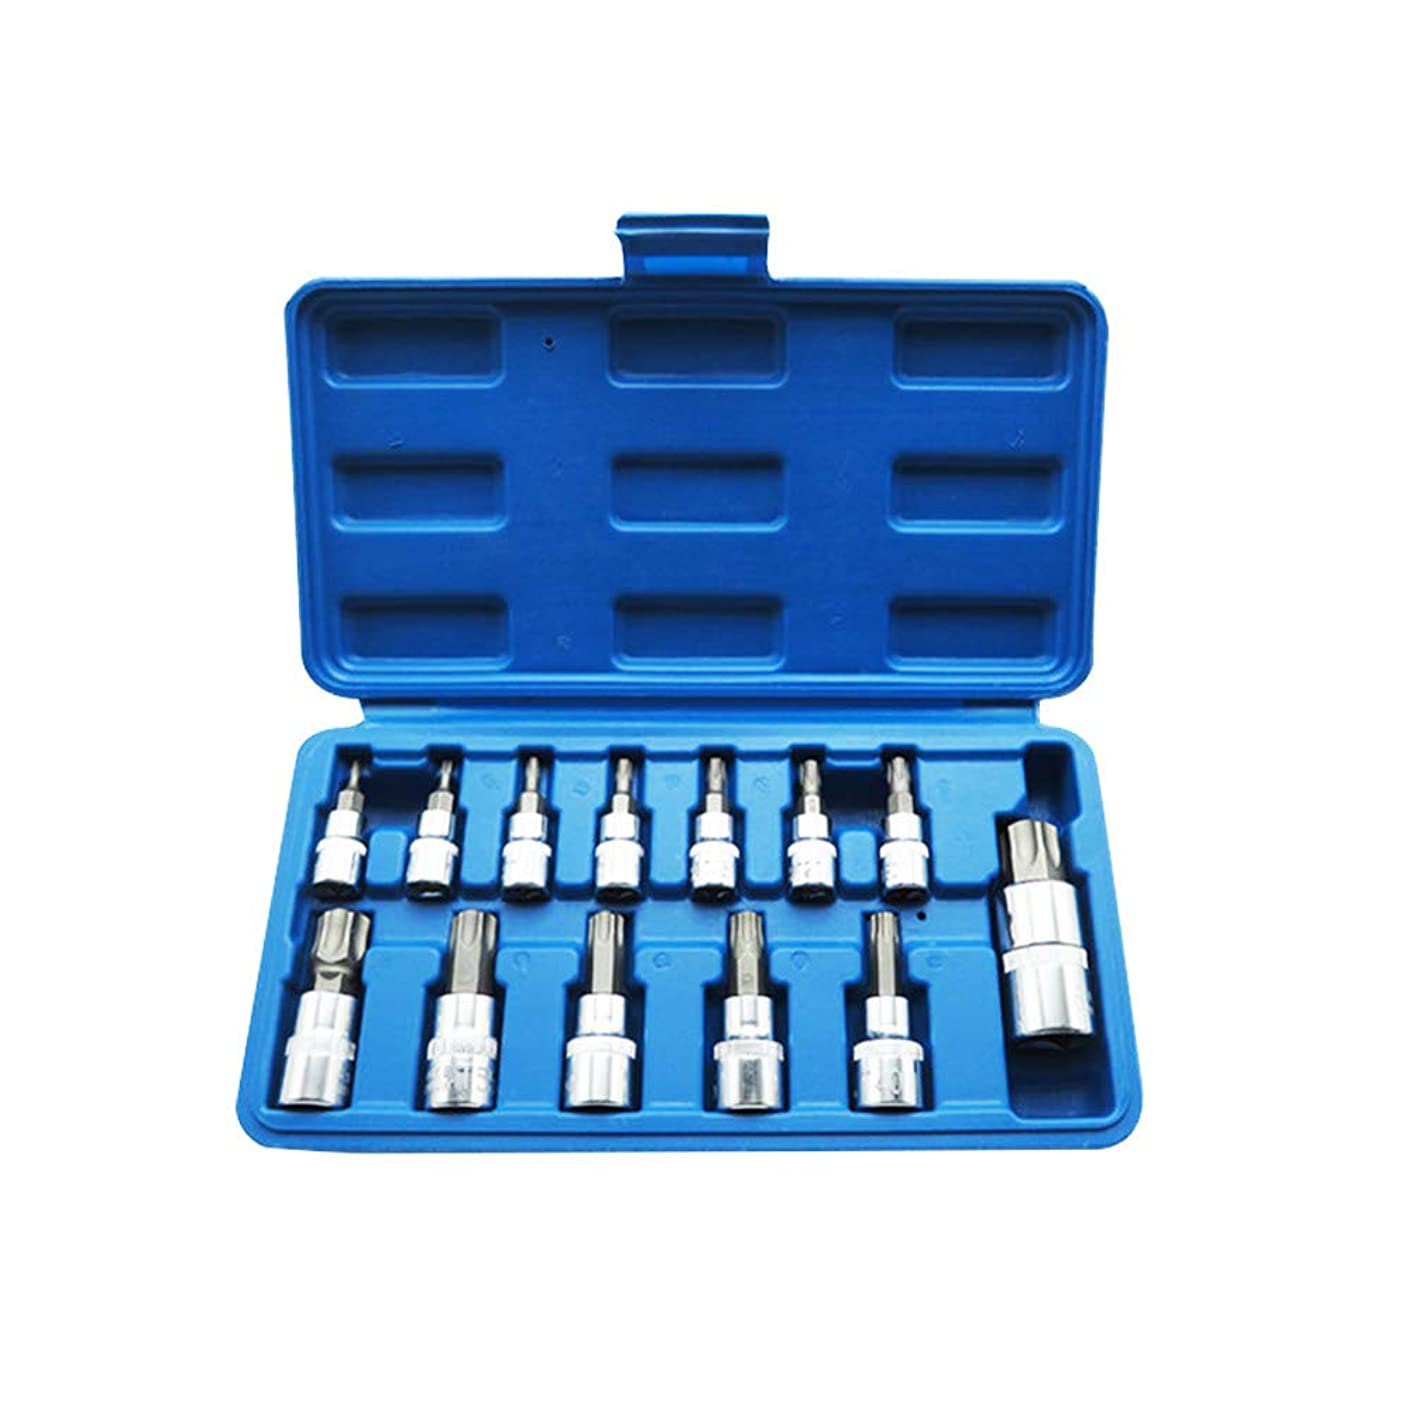 Bostar トルクスネジ用ビットセット 13点ソケットセット 差込角 6.35mm(1/4インチ) 10mm(3/8インチ) 12.6mm(1/2インチ) 収納ボックス付き